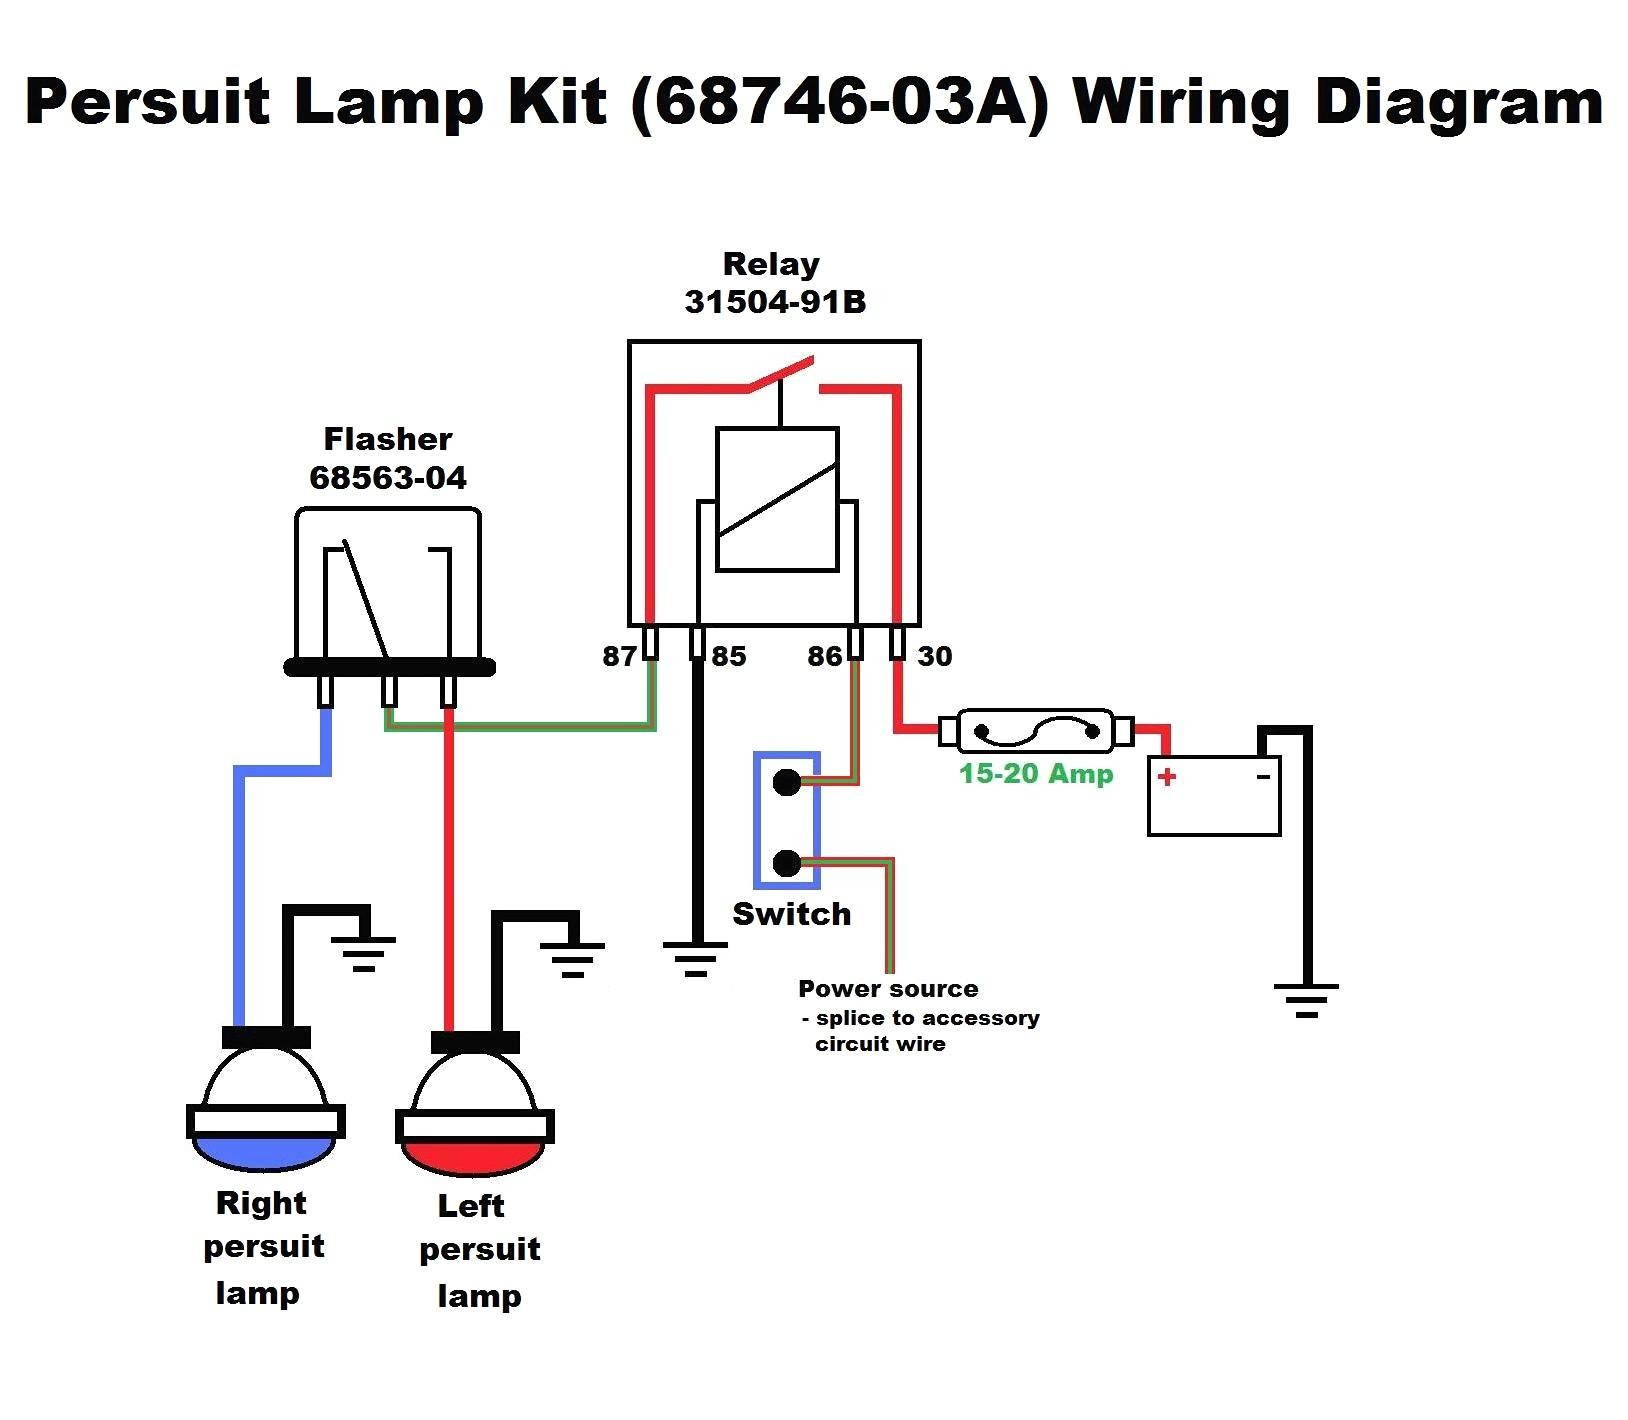 12 Volt Relay Wiring Diagram Unique 12v Relay Wiring